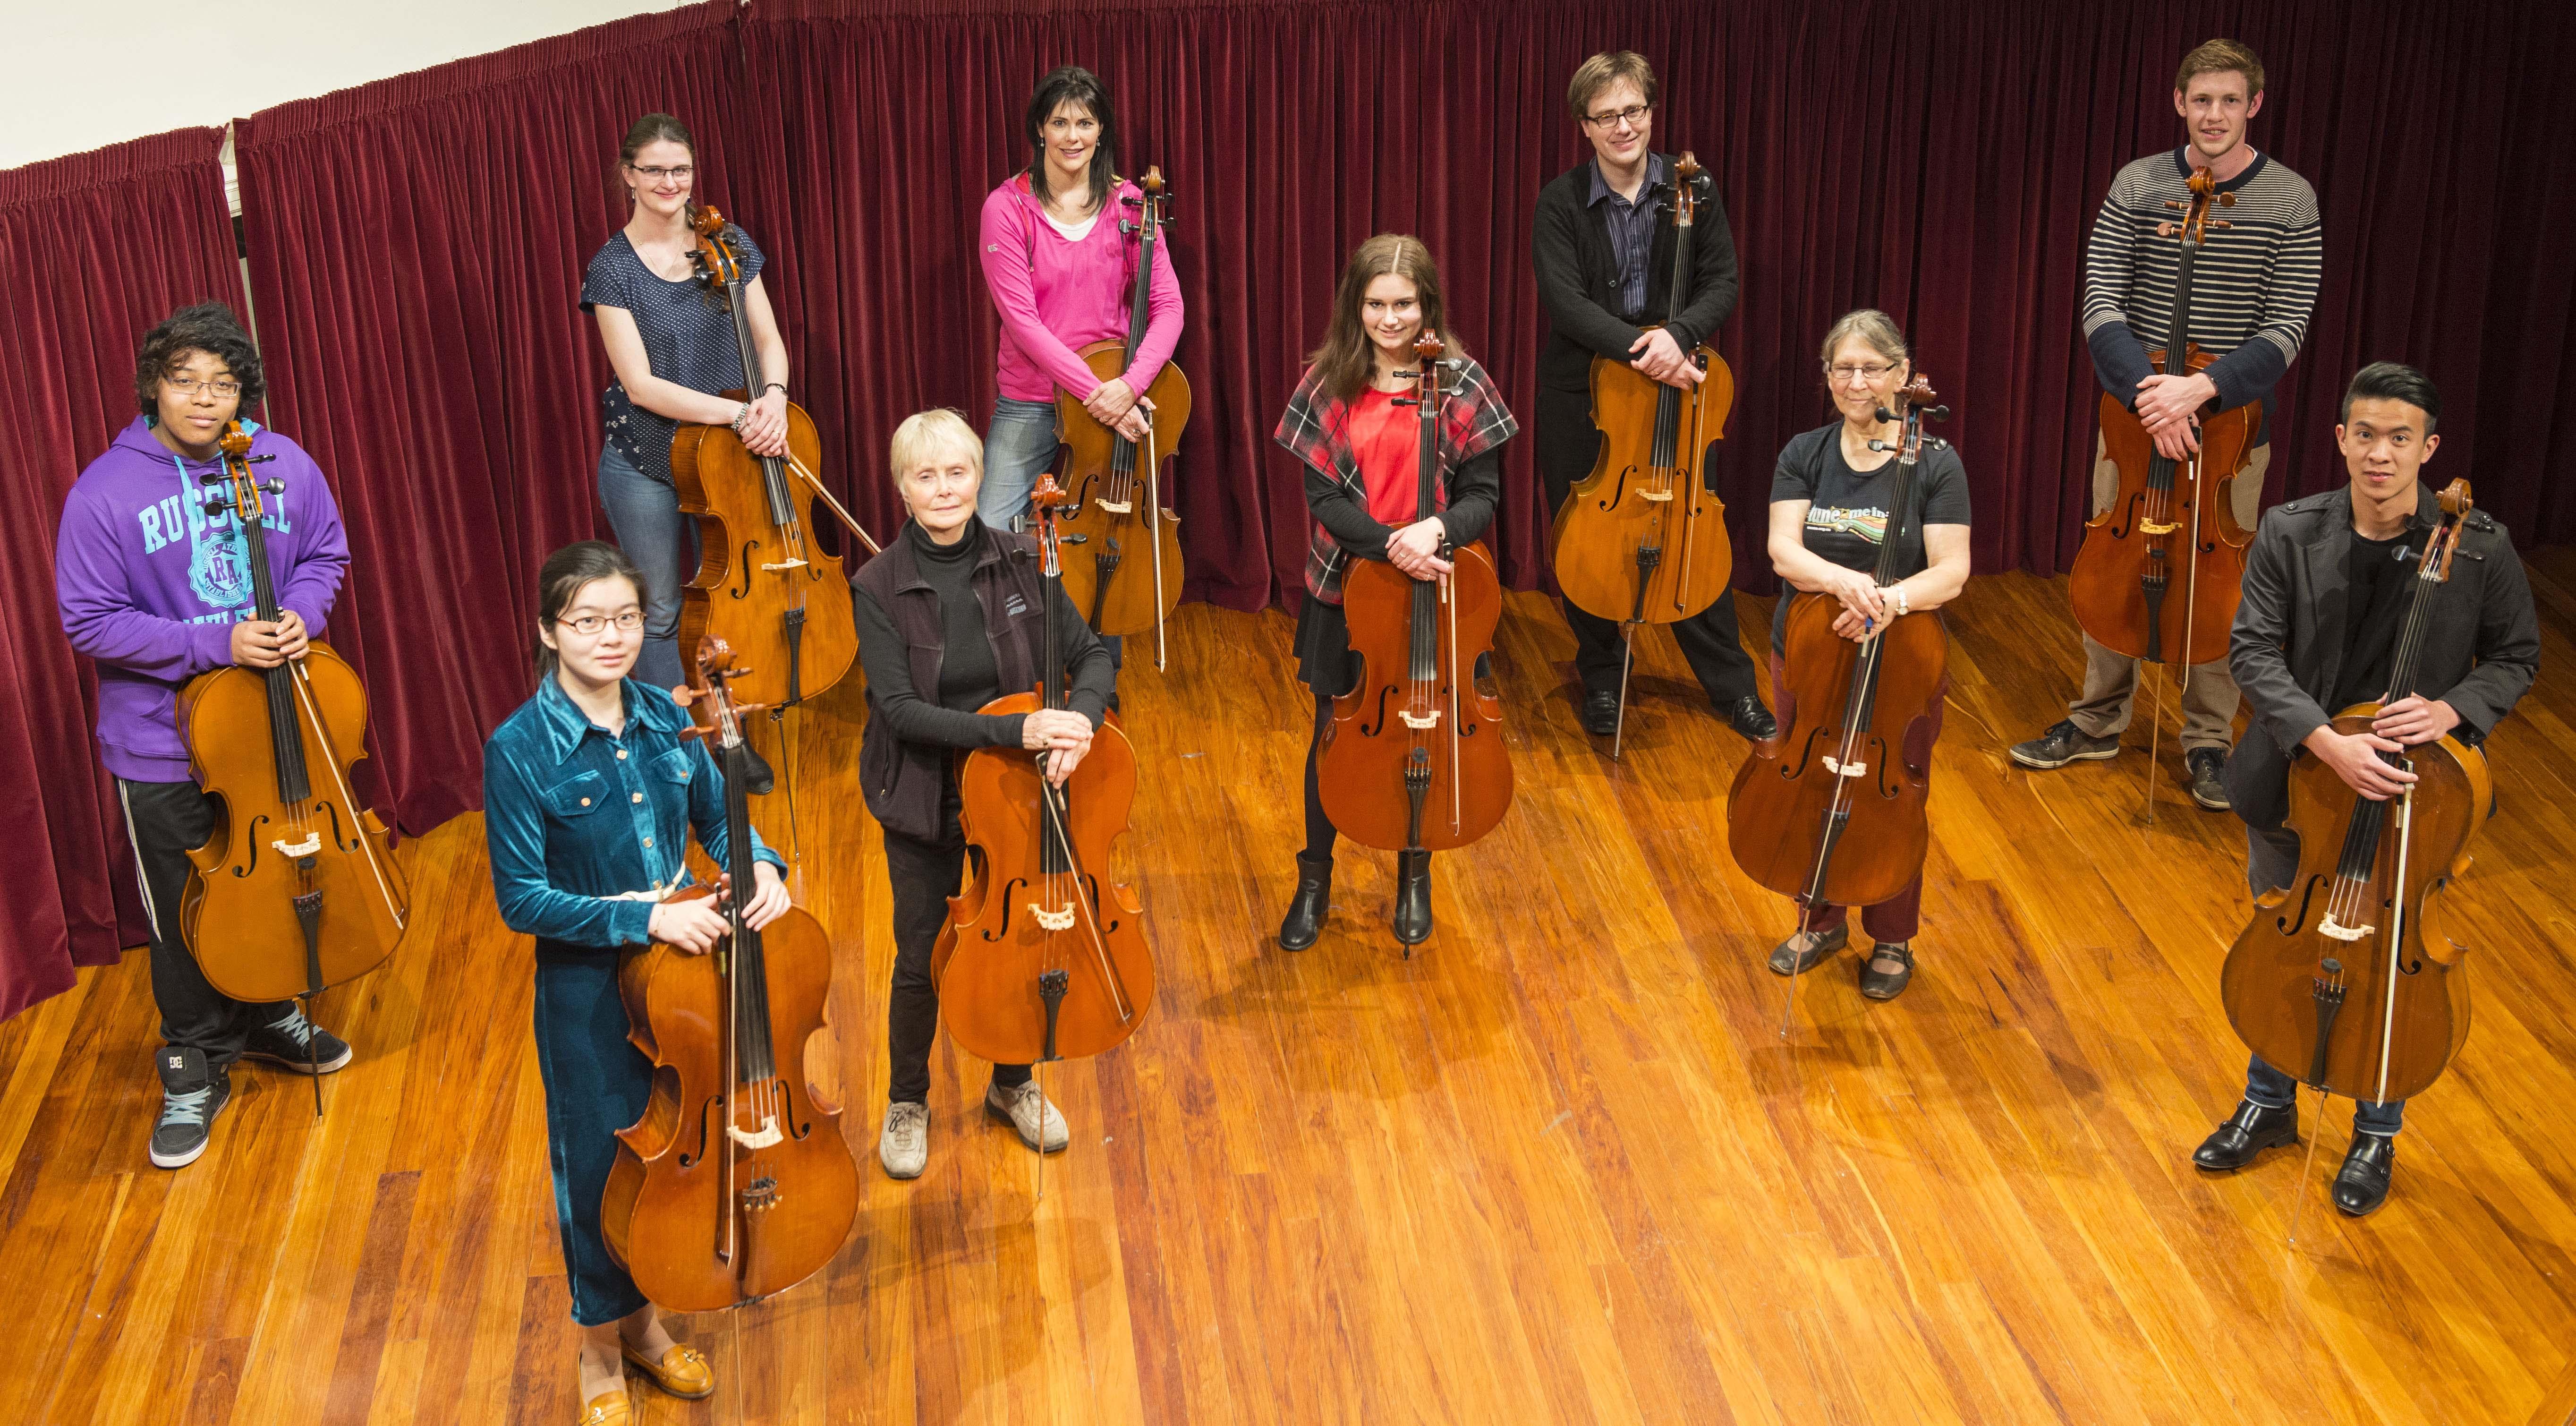 Cellists of Otago